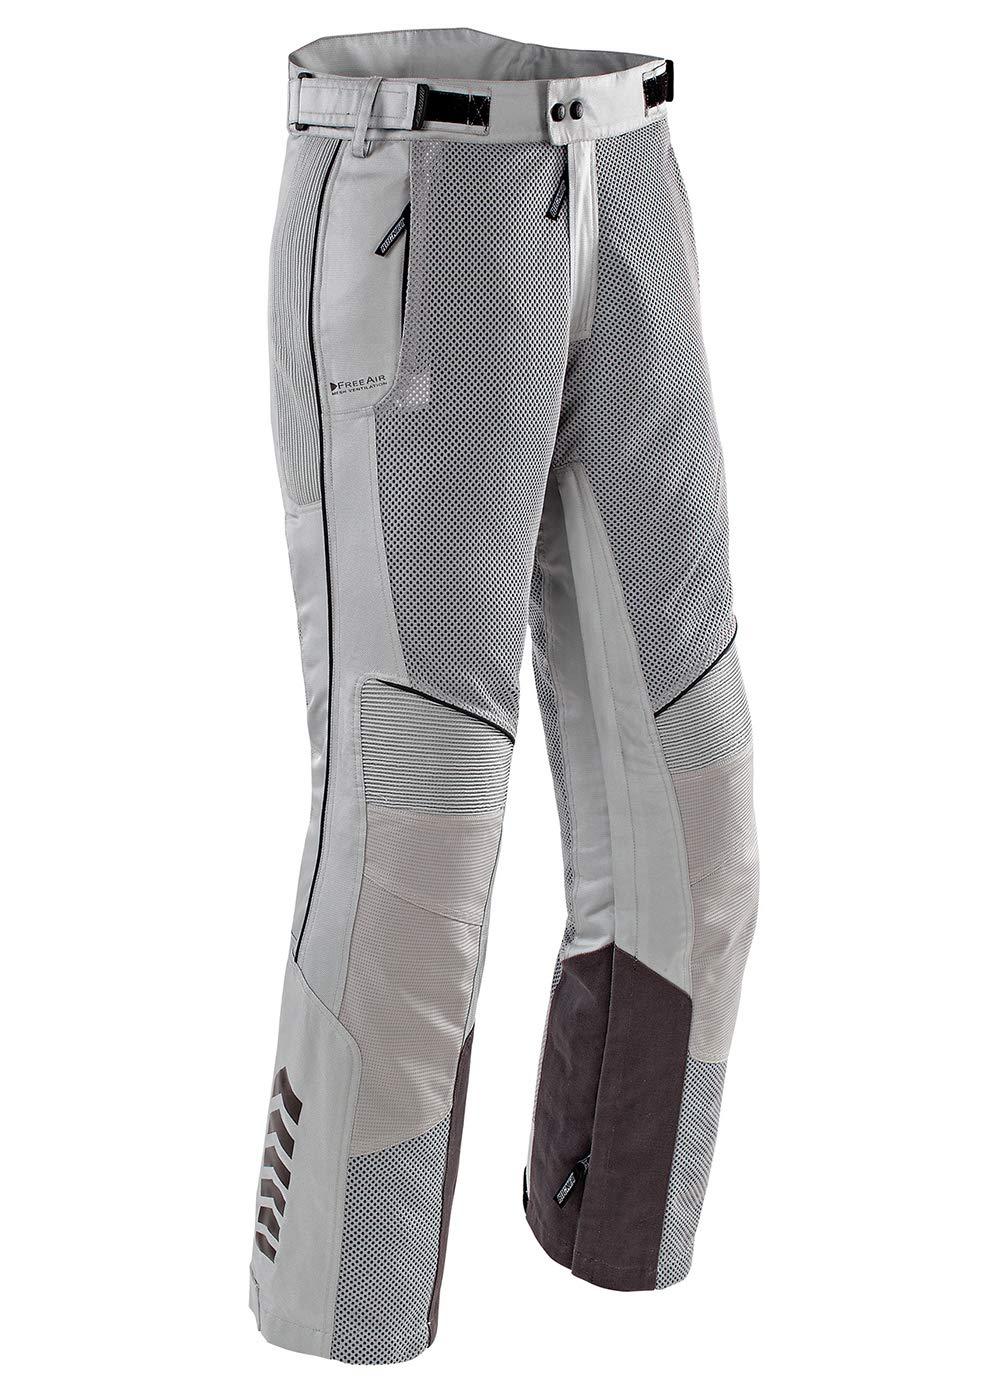 Joe Rocket Phoenix Ion Men's Mesh Motorcycle Pants (Silver, XX-Large Short) 1518-3616